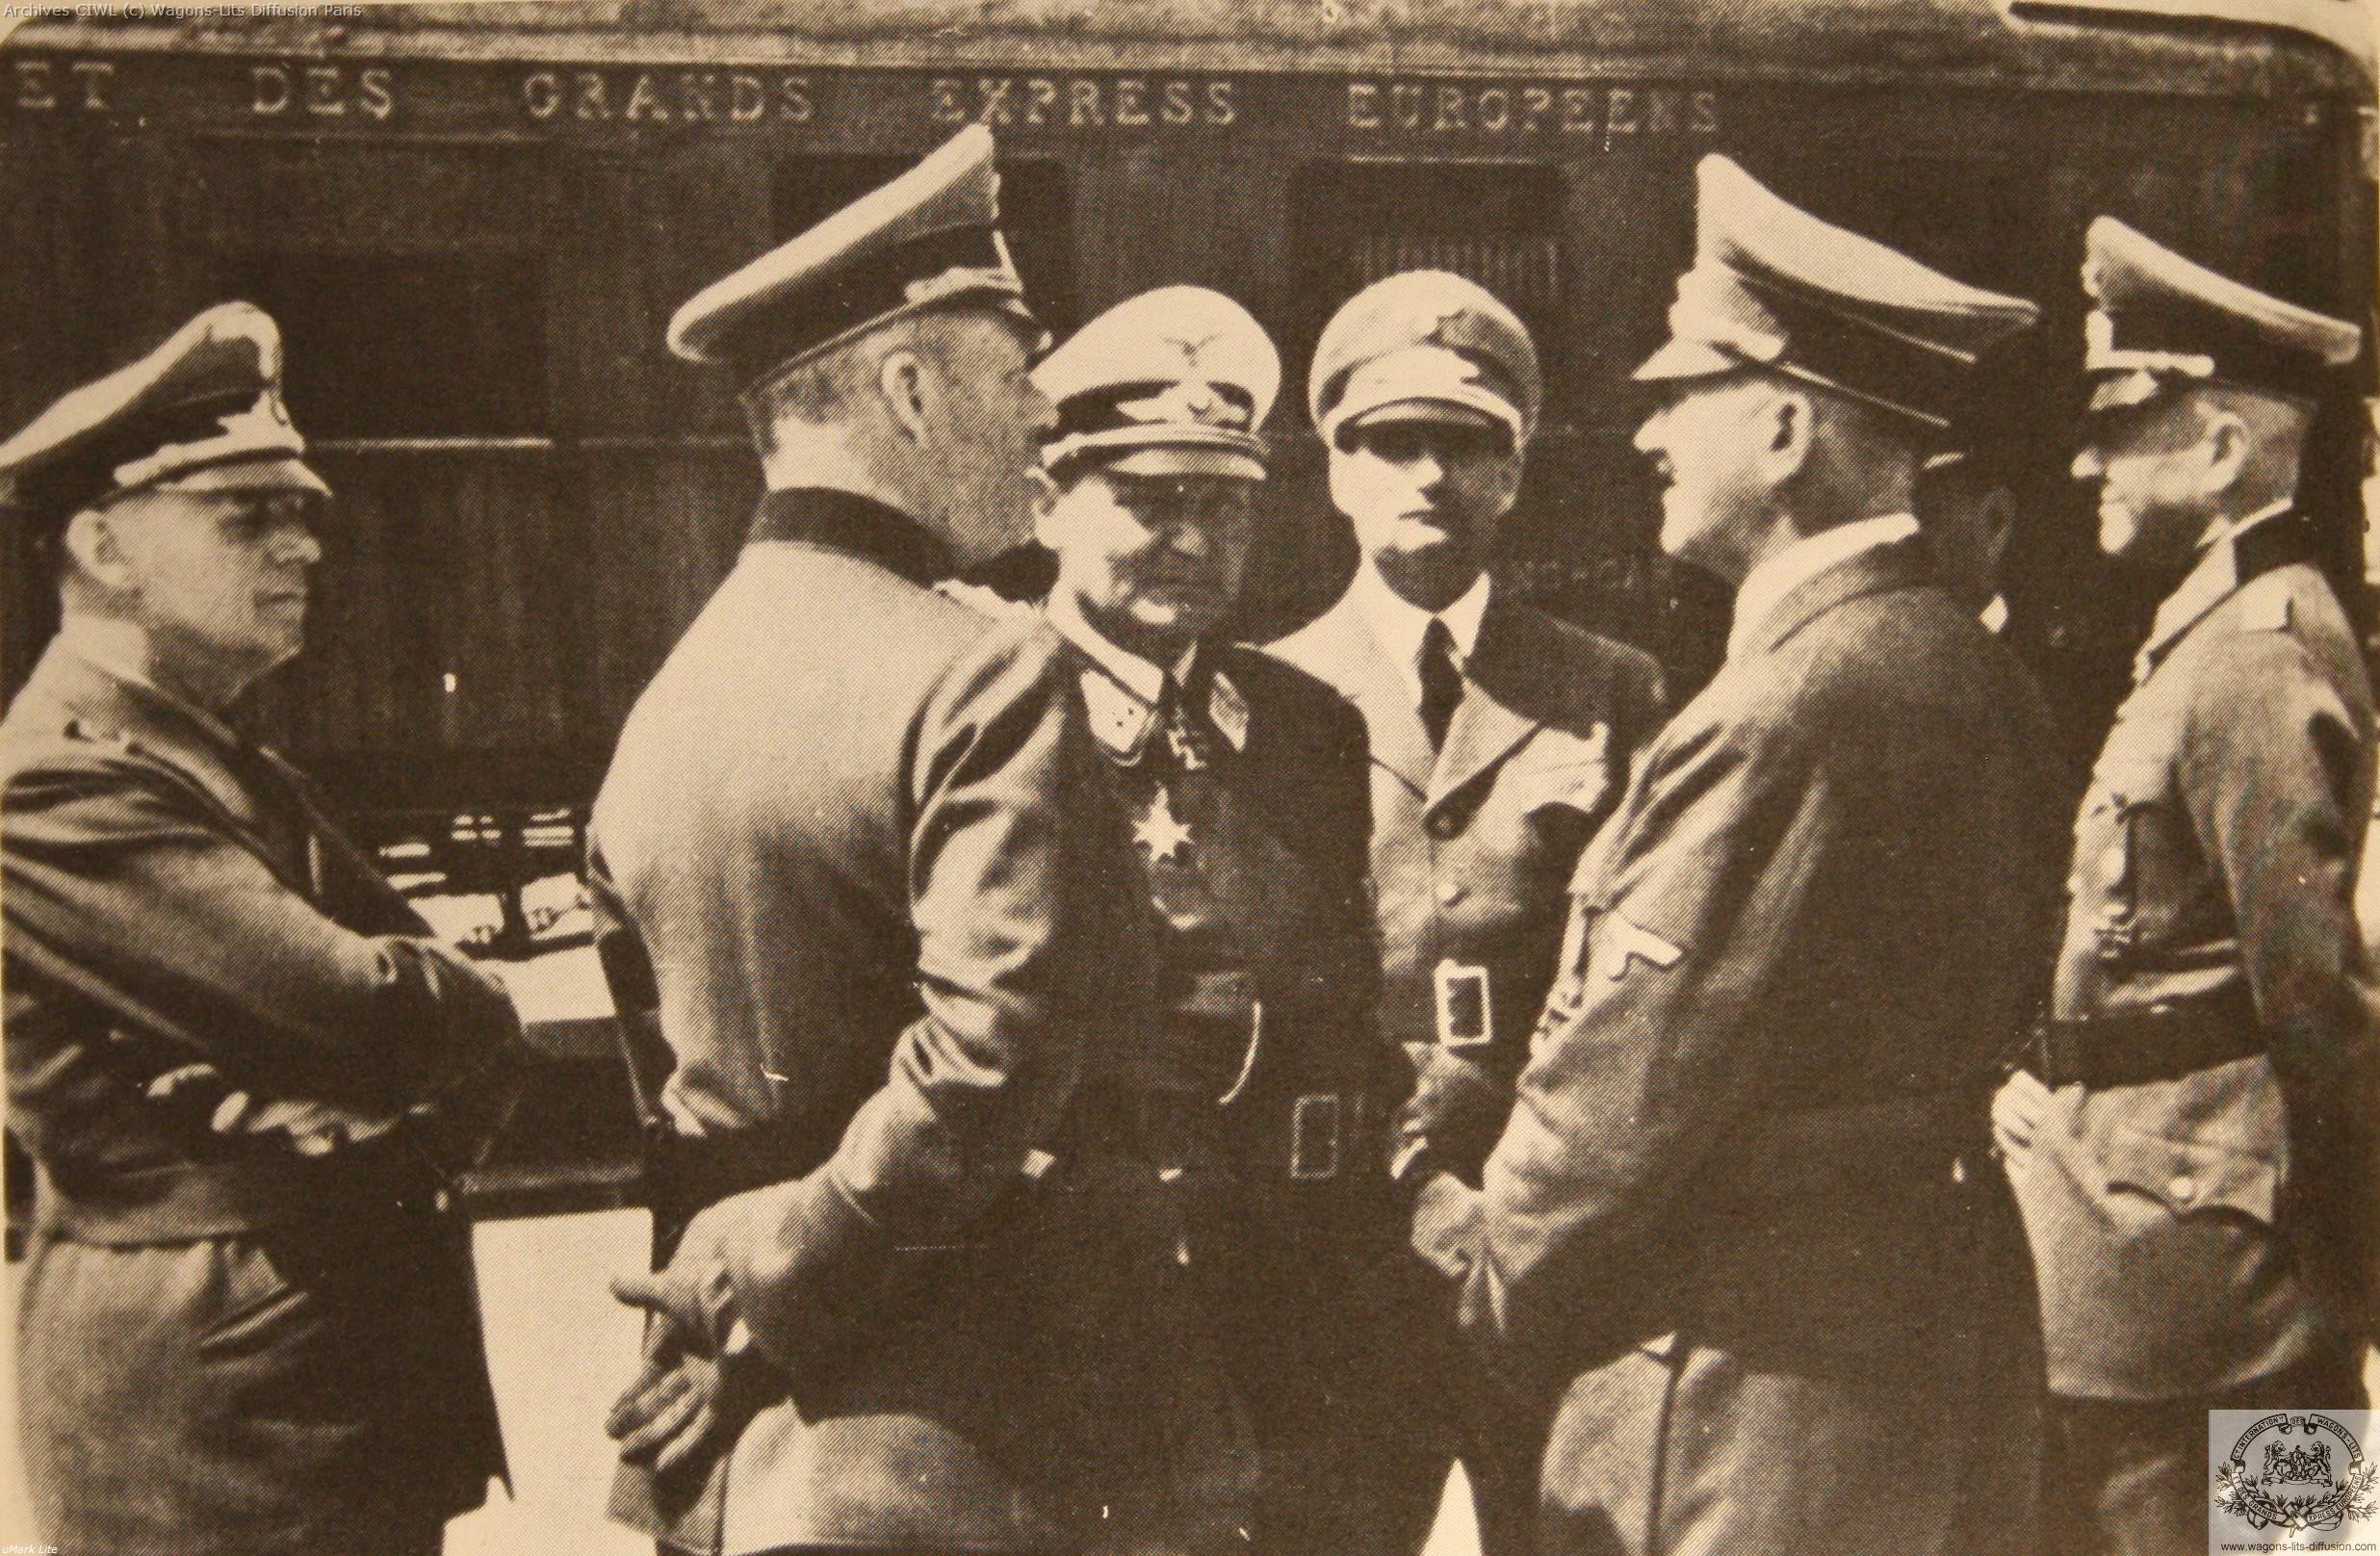 Wl armistice hitler goering vr 2419 en 1940 2